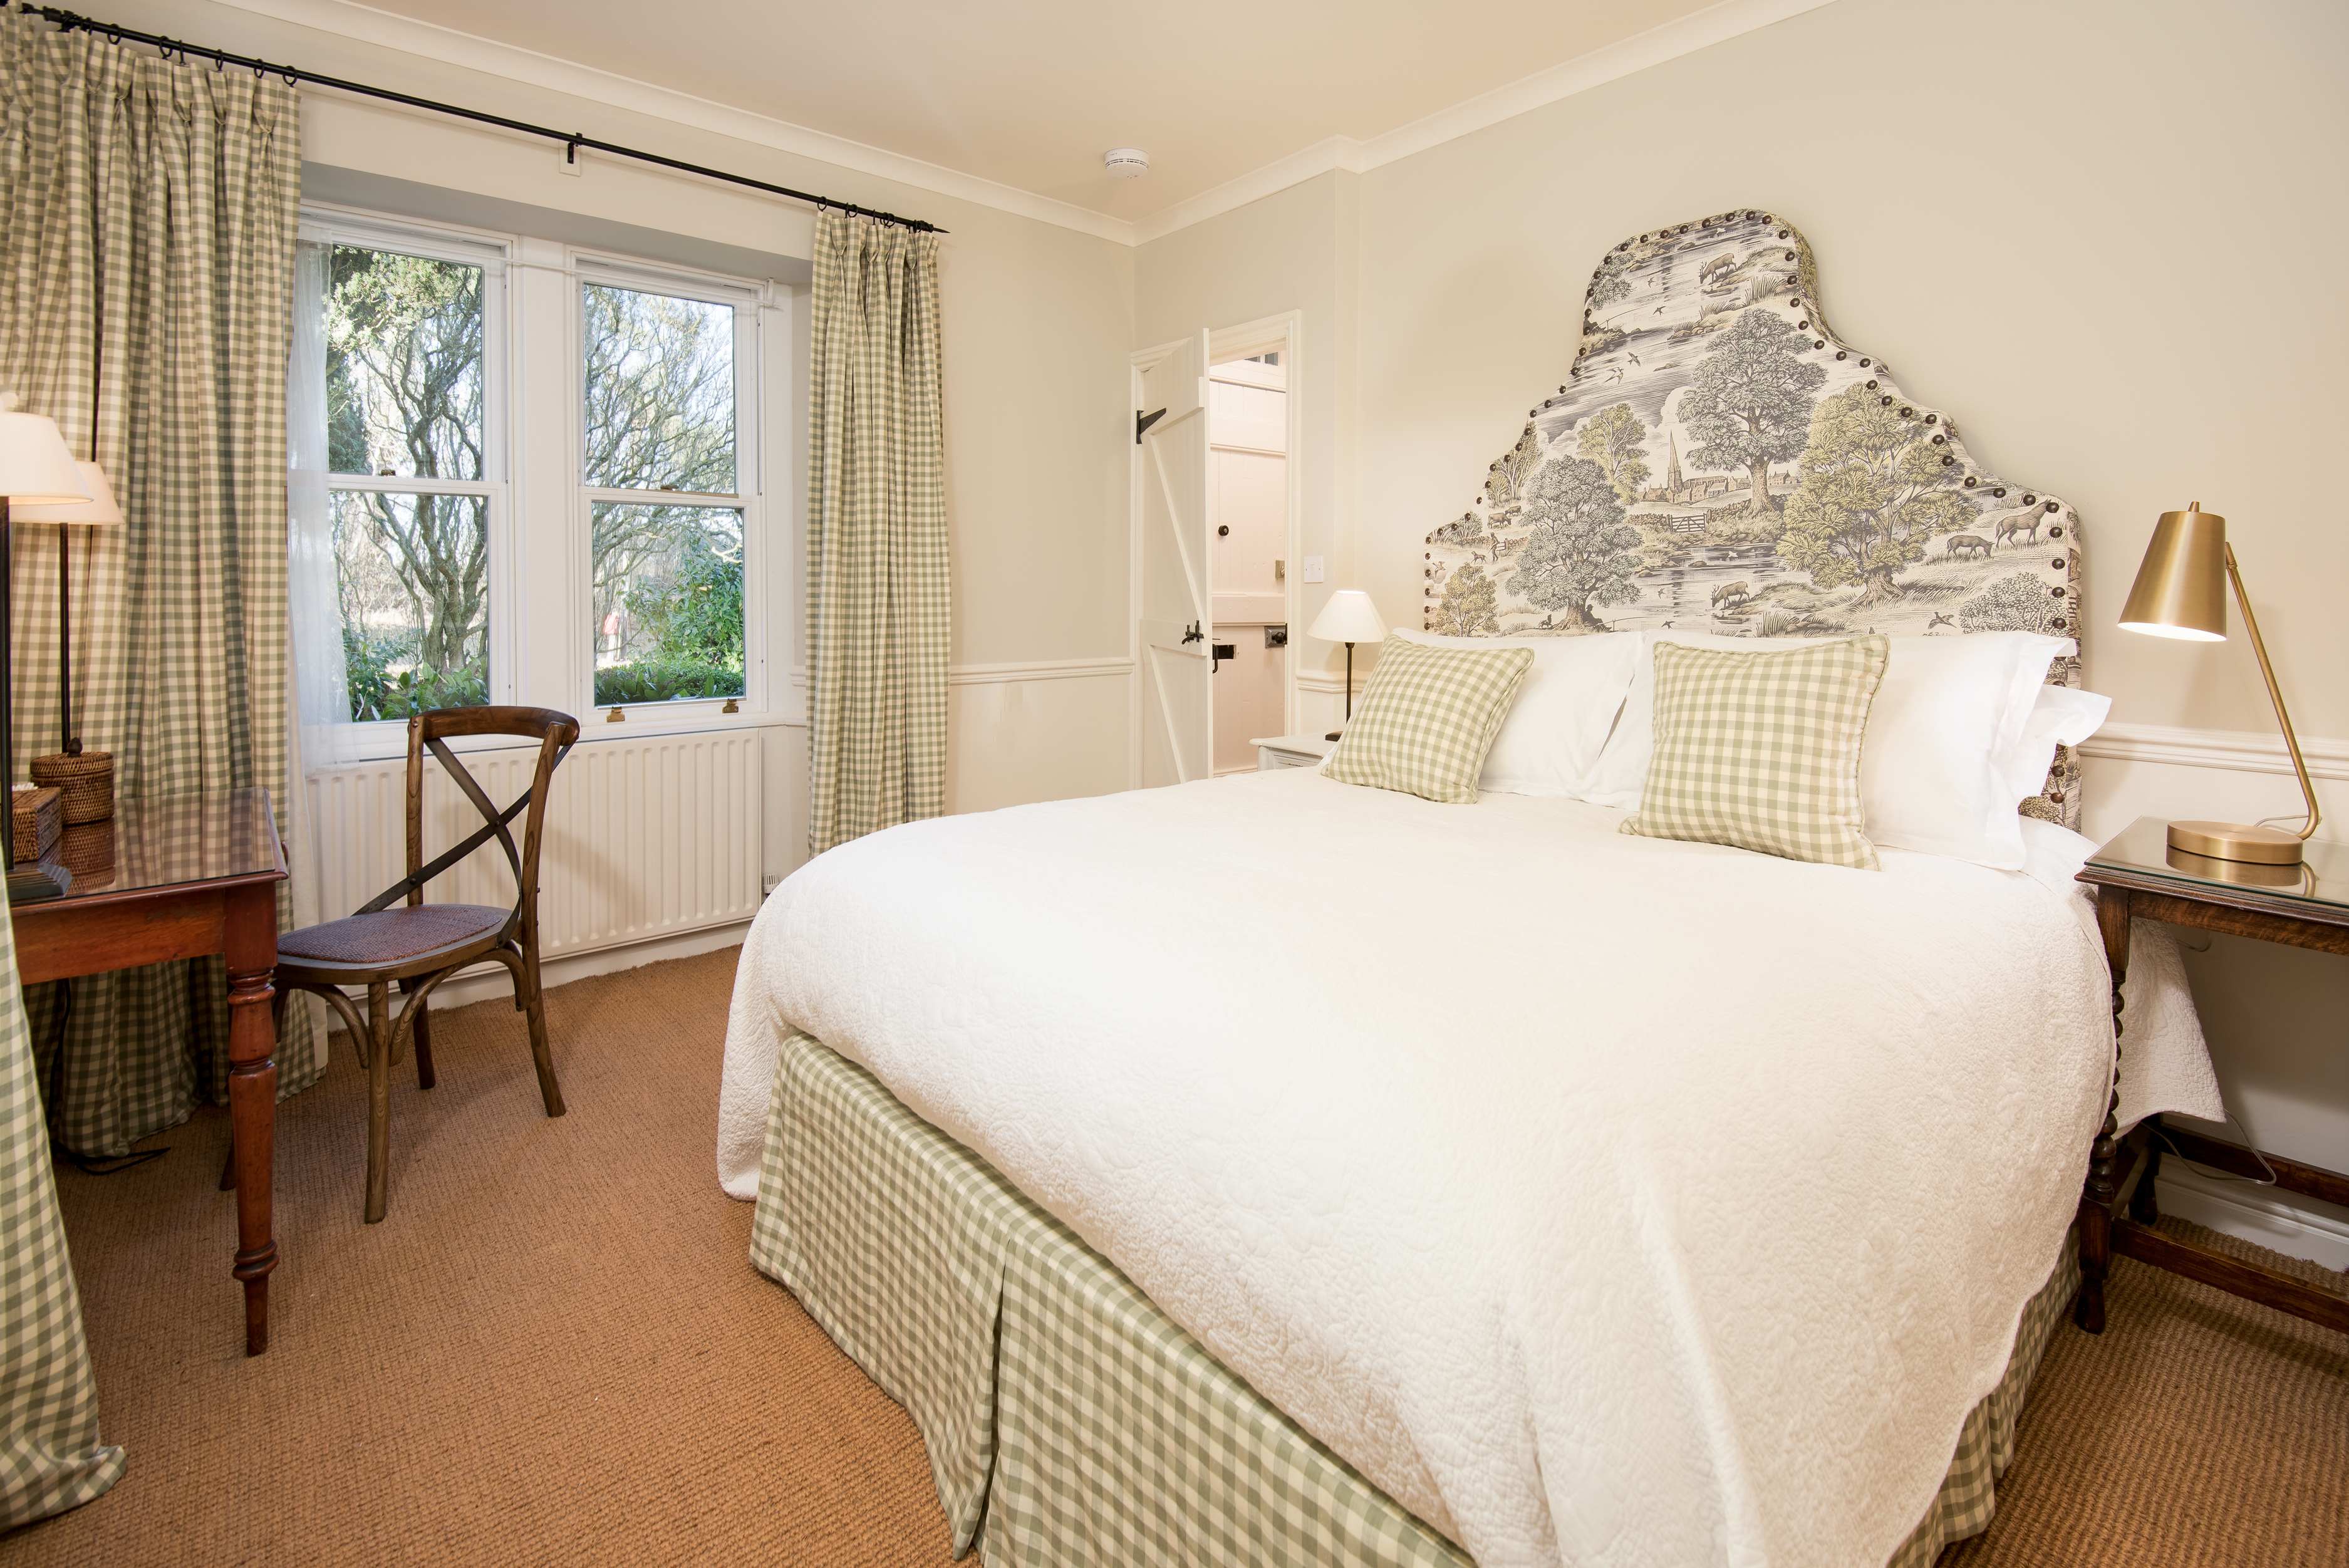 Milne Graden Magic holiday cottage North Lodge Bedroom Bespoke Fabric Headboard British Illustrator Andrew Davidson